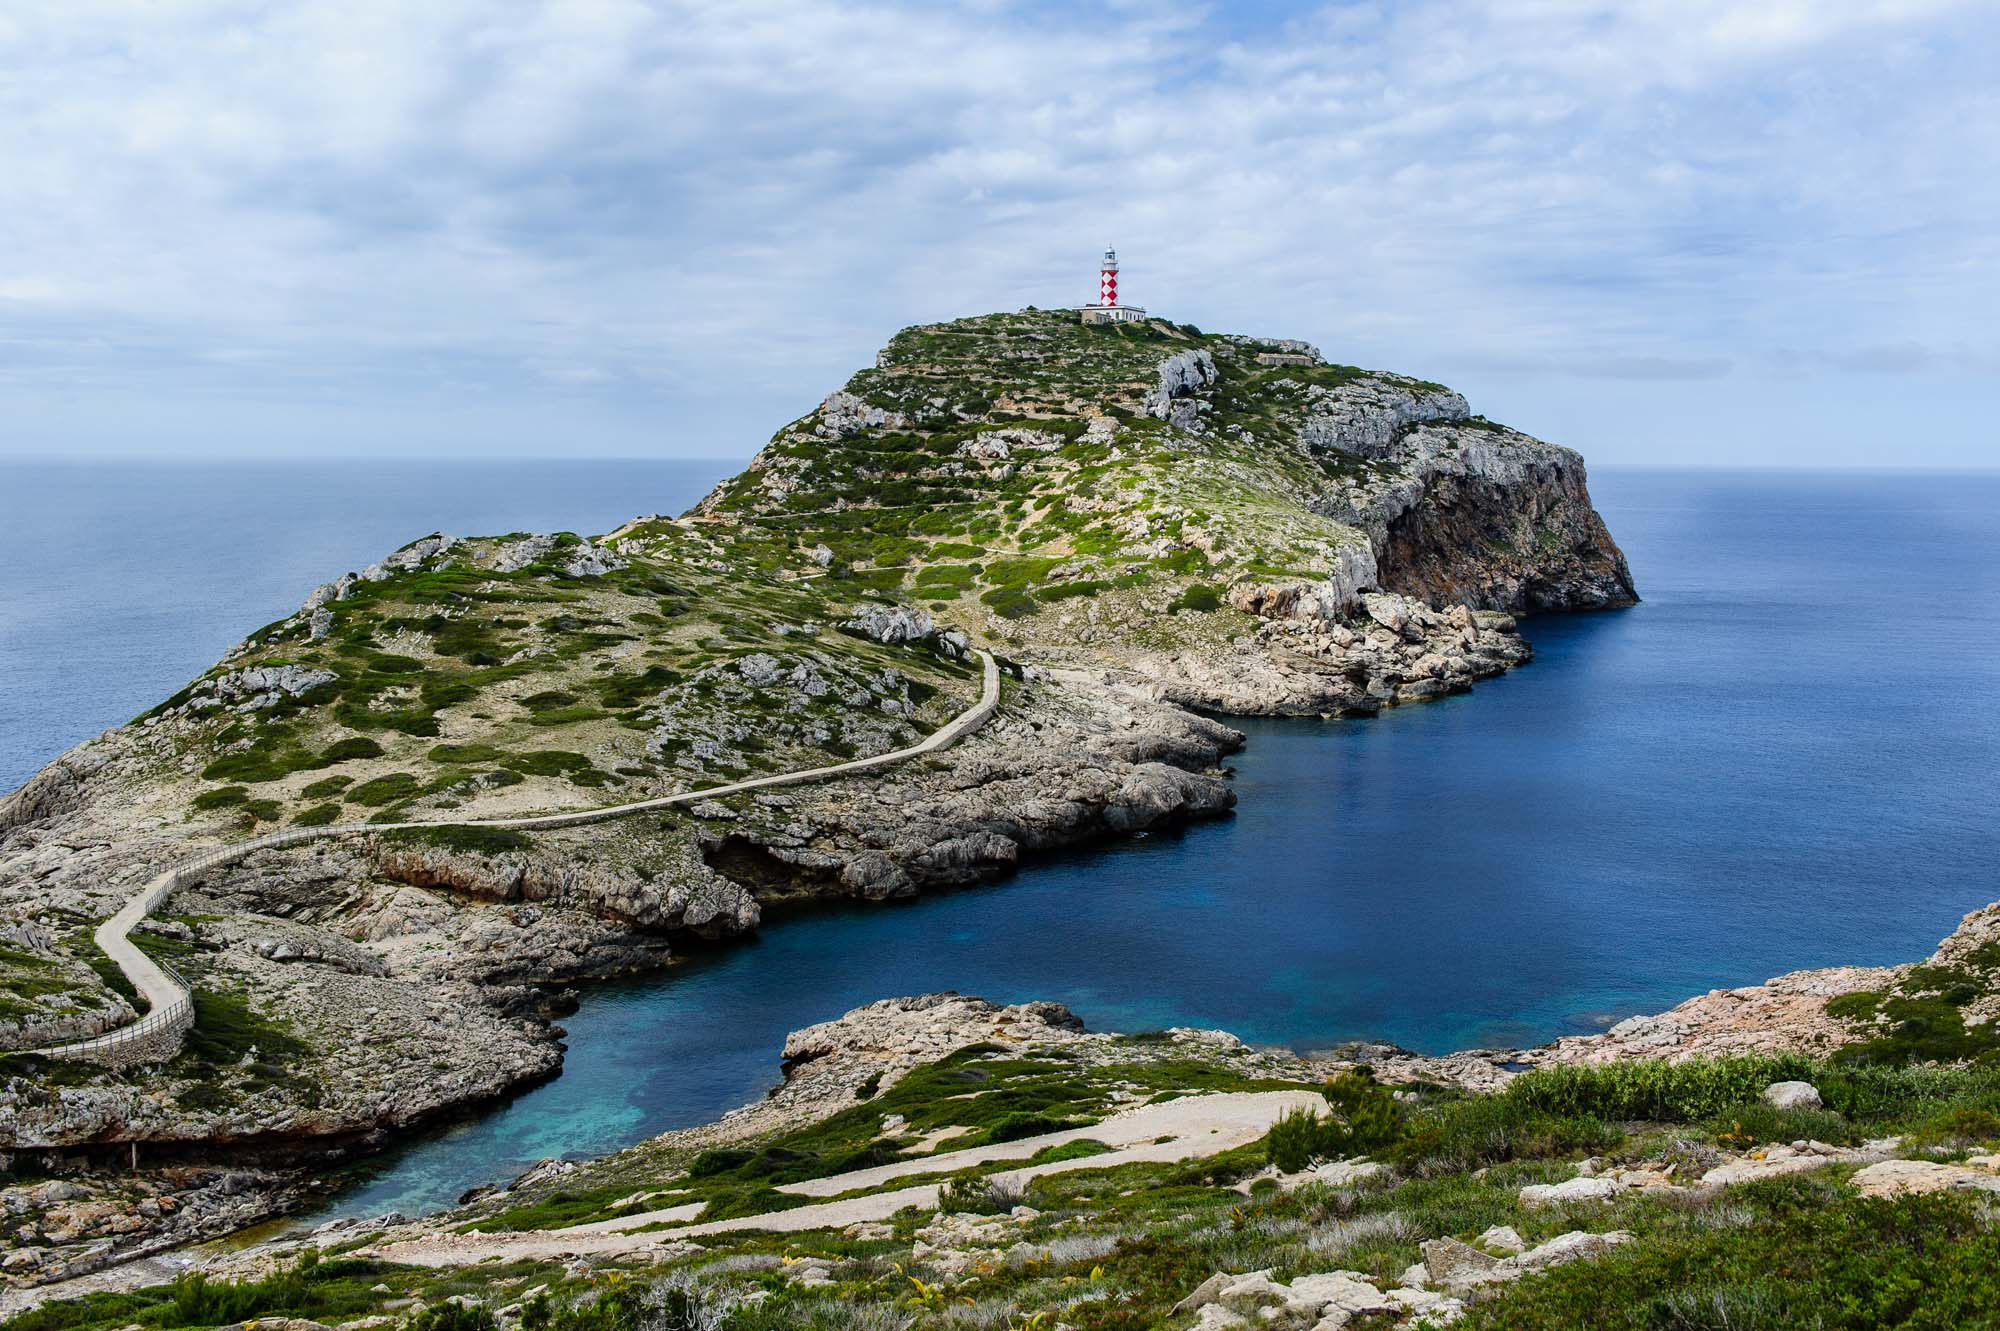 La Cabrera promete paisajes tan espectaculares como este. Foto: Shutterstock.